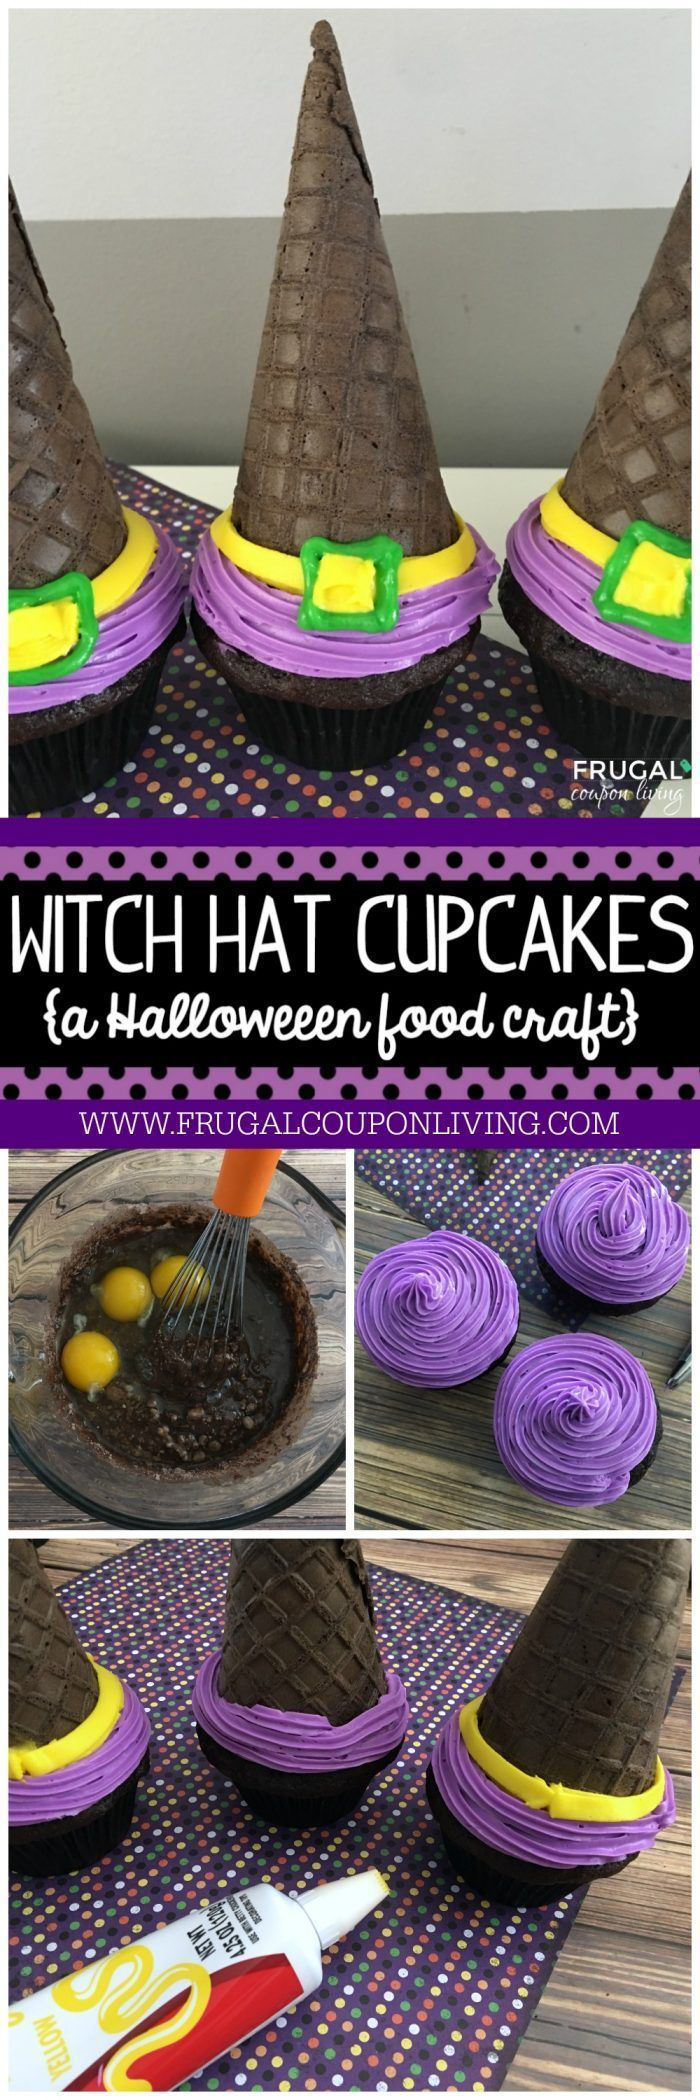 halloween witch hat cupcakes | recipe | halloween | pinterest